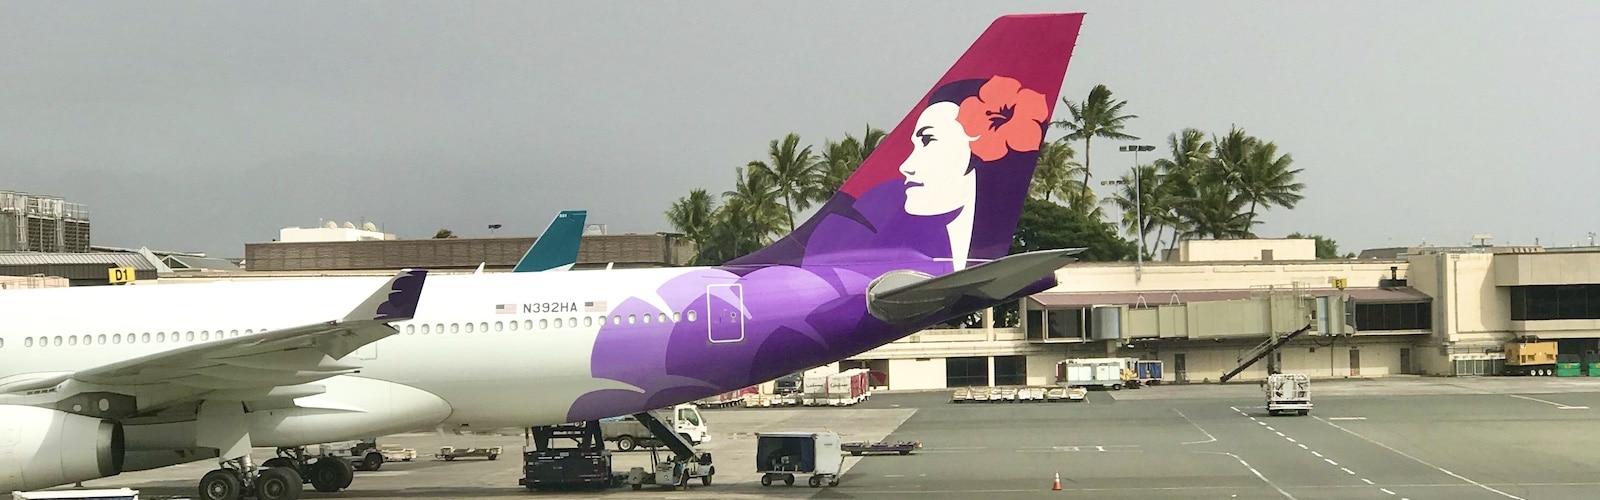 Hawaiian Airlines, Honolulu Airport, Oahu, Hawaii